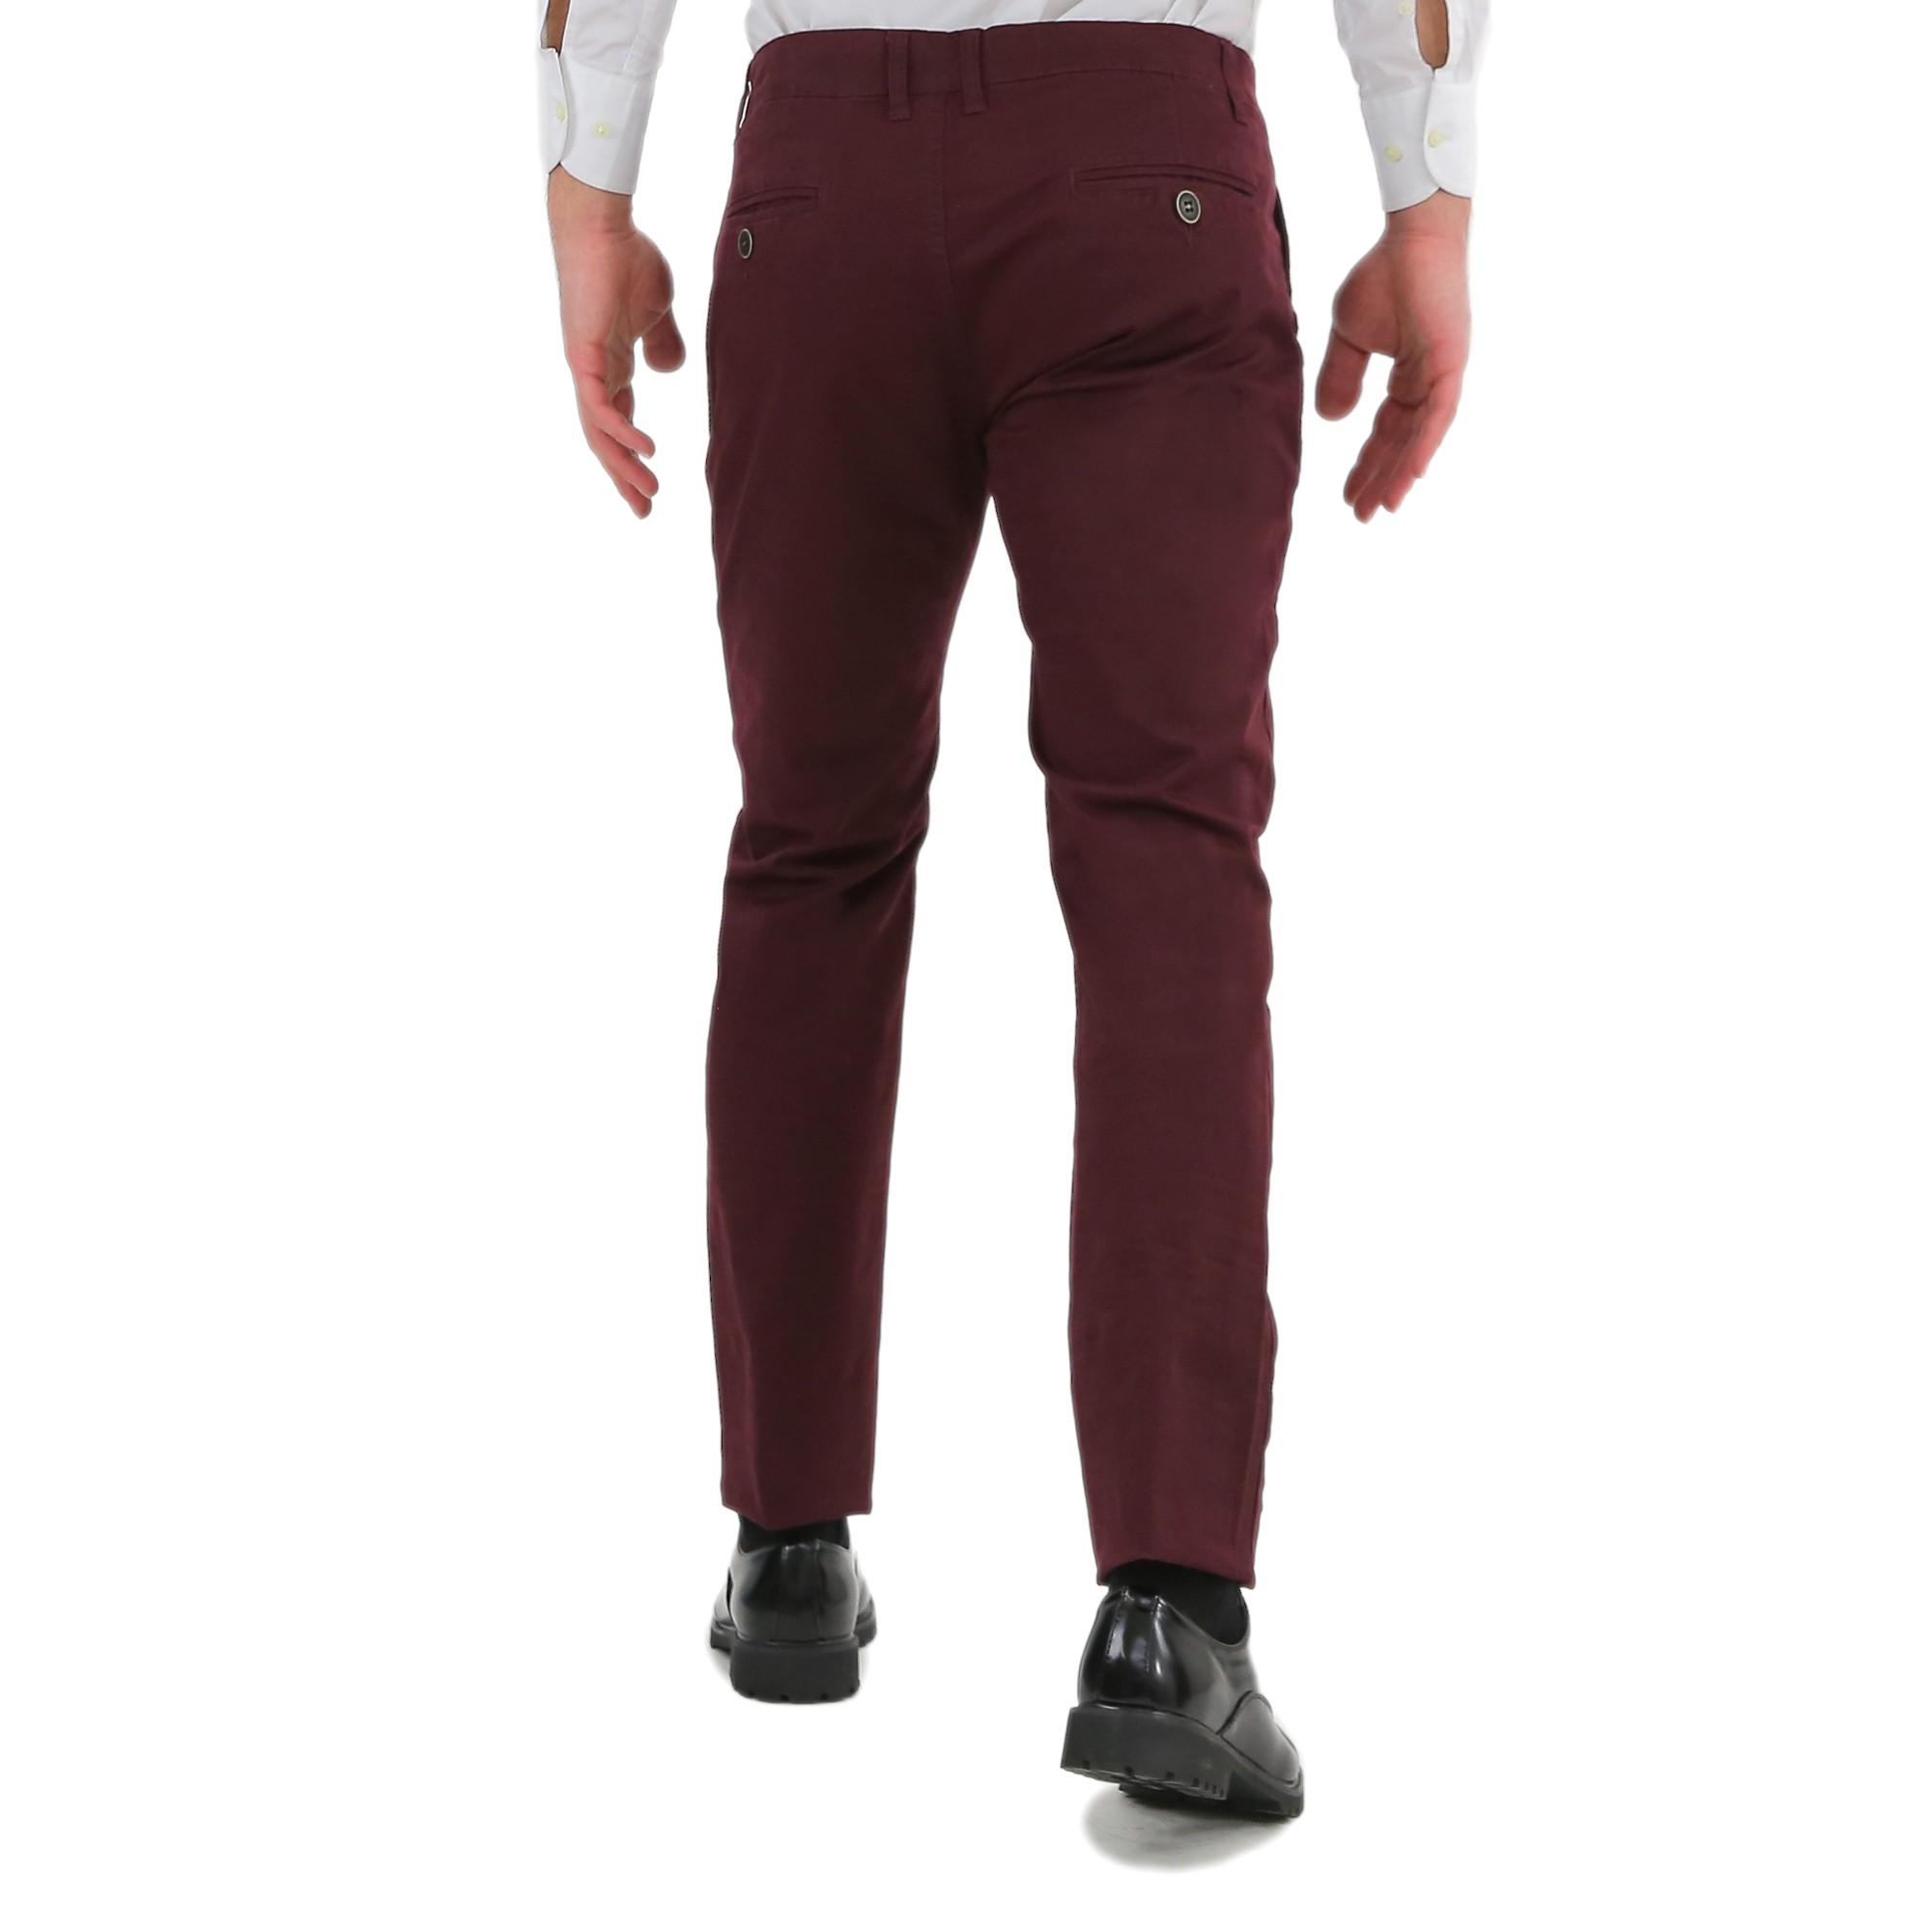 Pantaloni-Uomo-Slim-Fit-Eleganti-Invernali-Cargo-Classico-Chino-Kaki-Tasca-Ameri miniatura 13